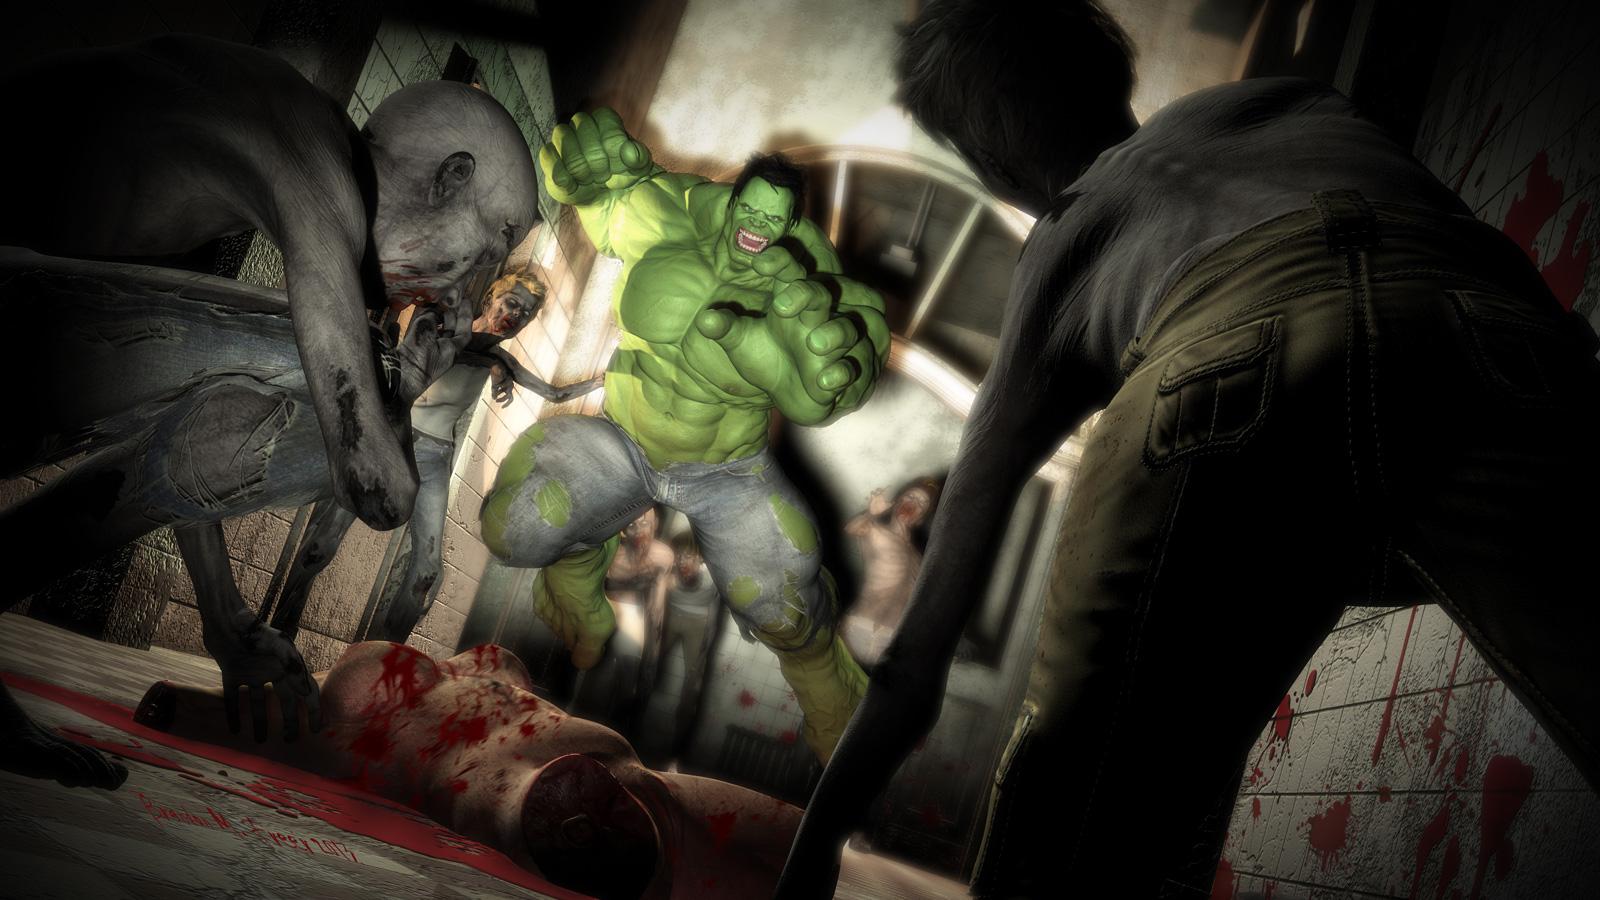 Frankenstein vs Zombie Apocalypse 1600x900